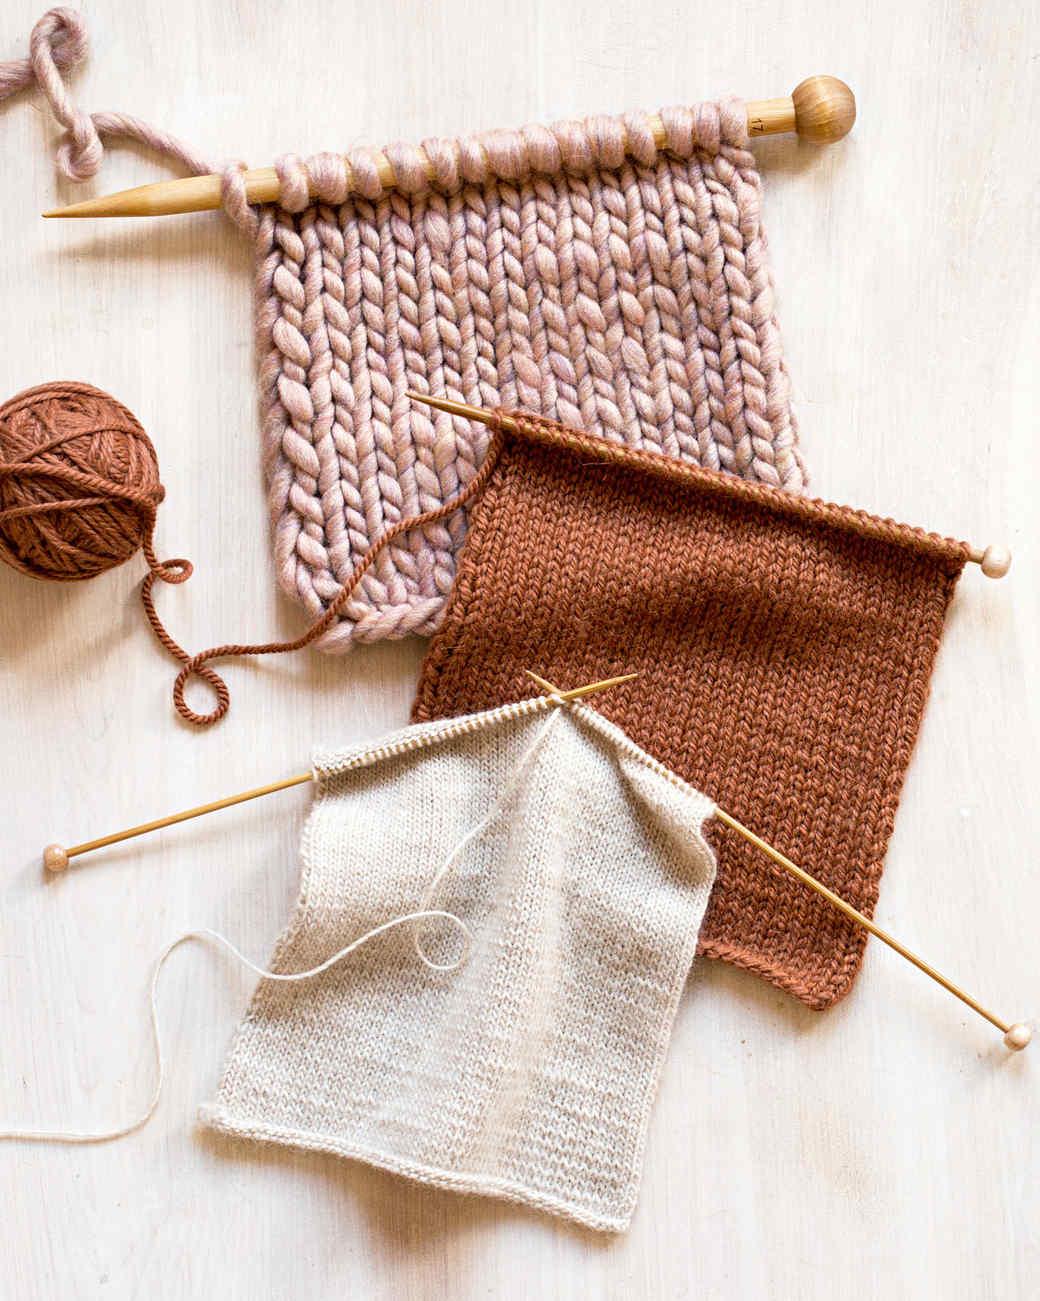 yarn swatches